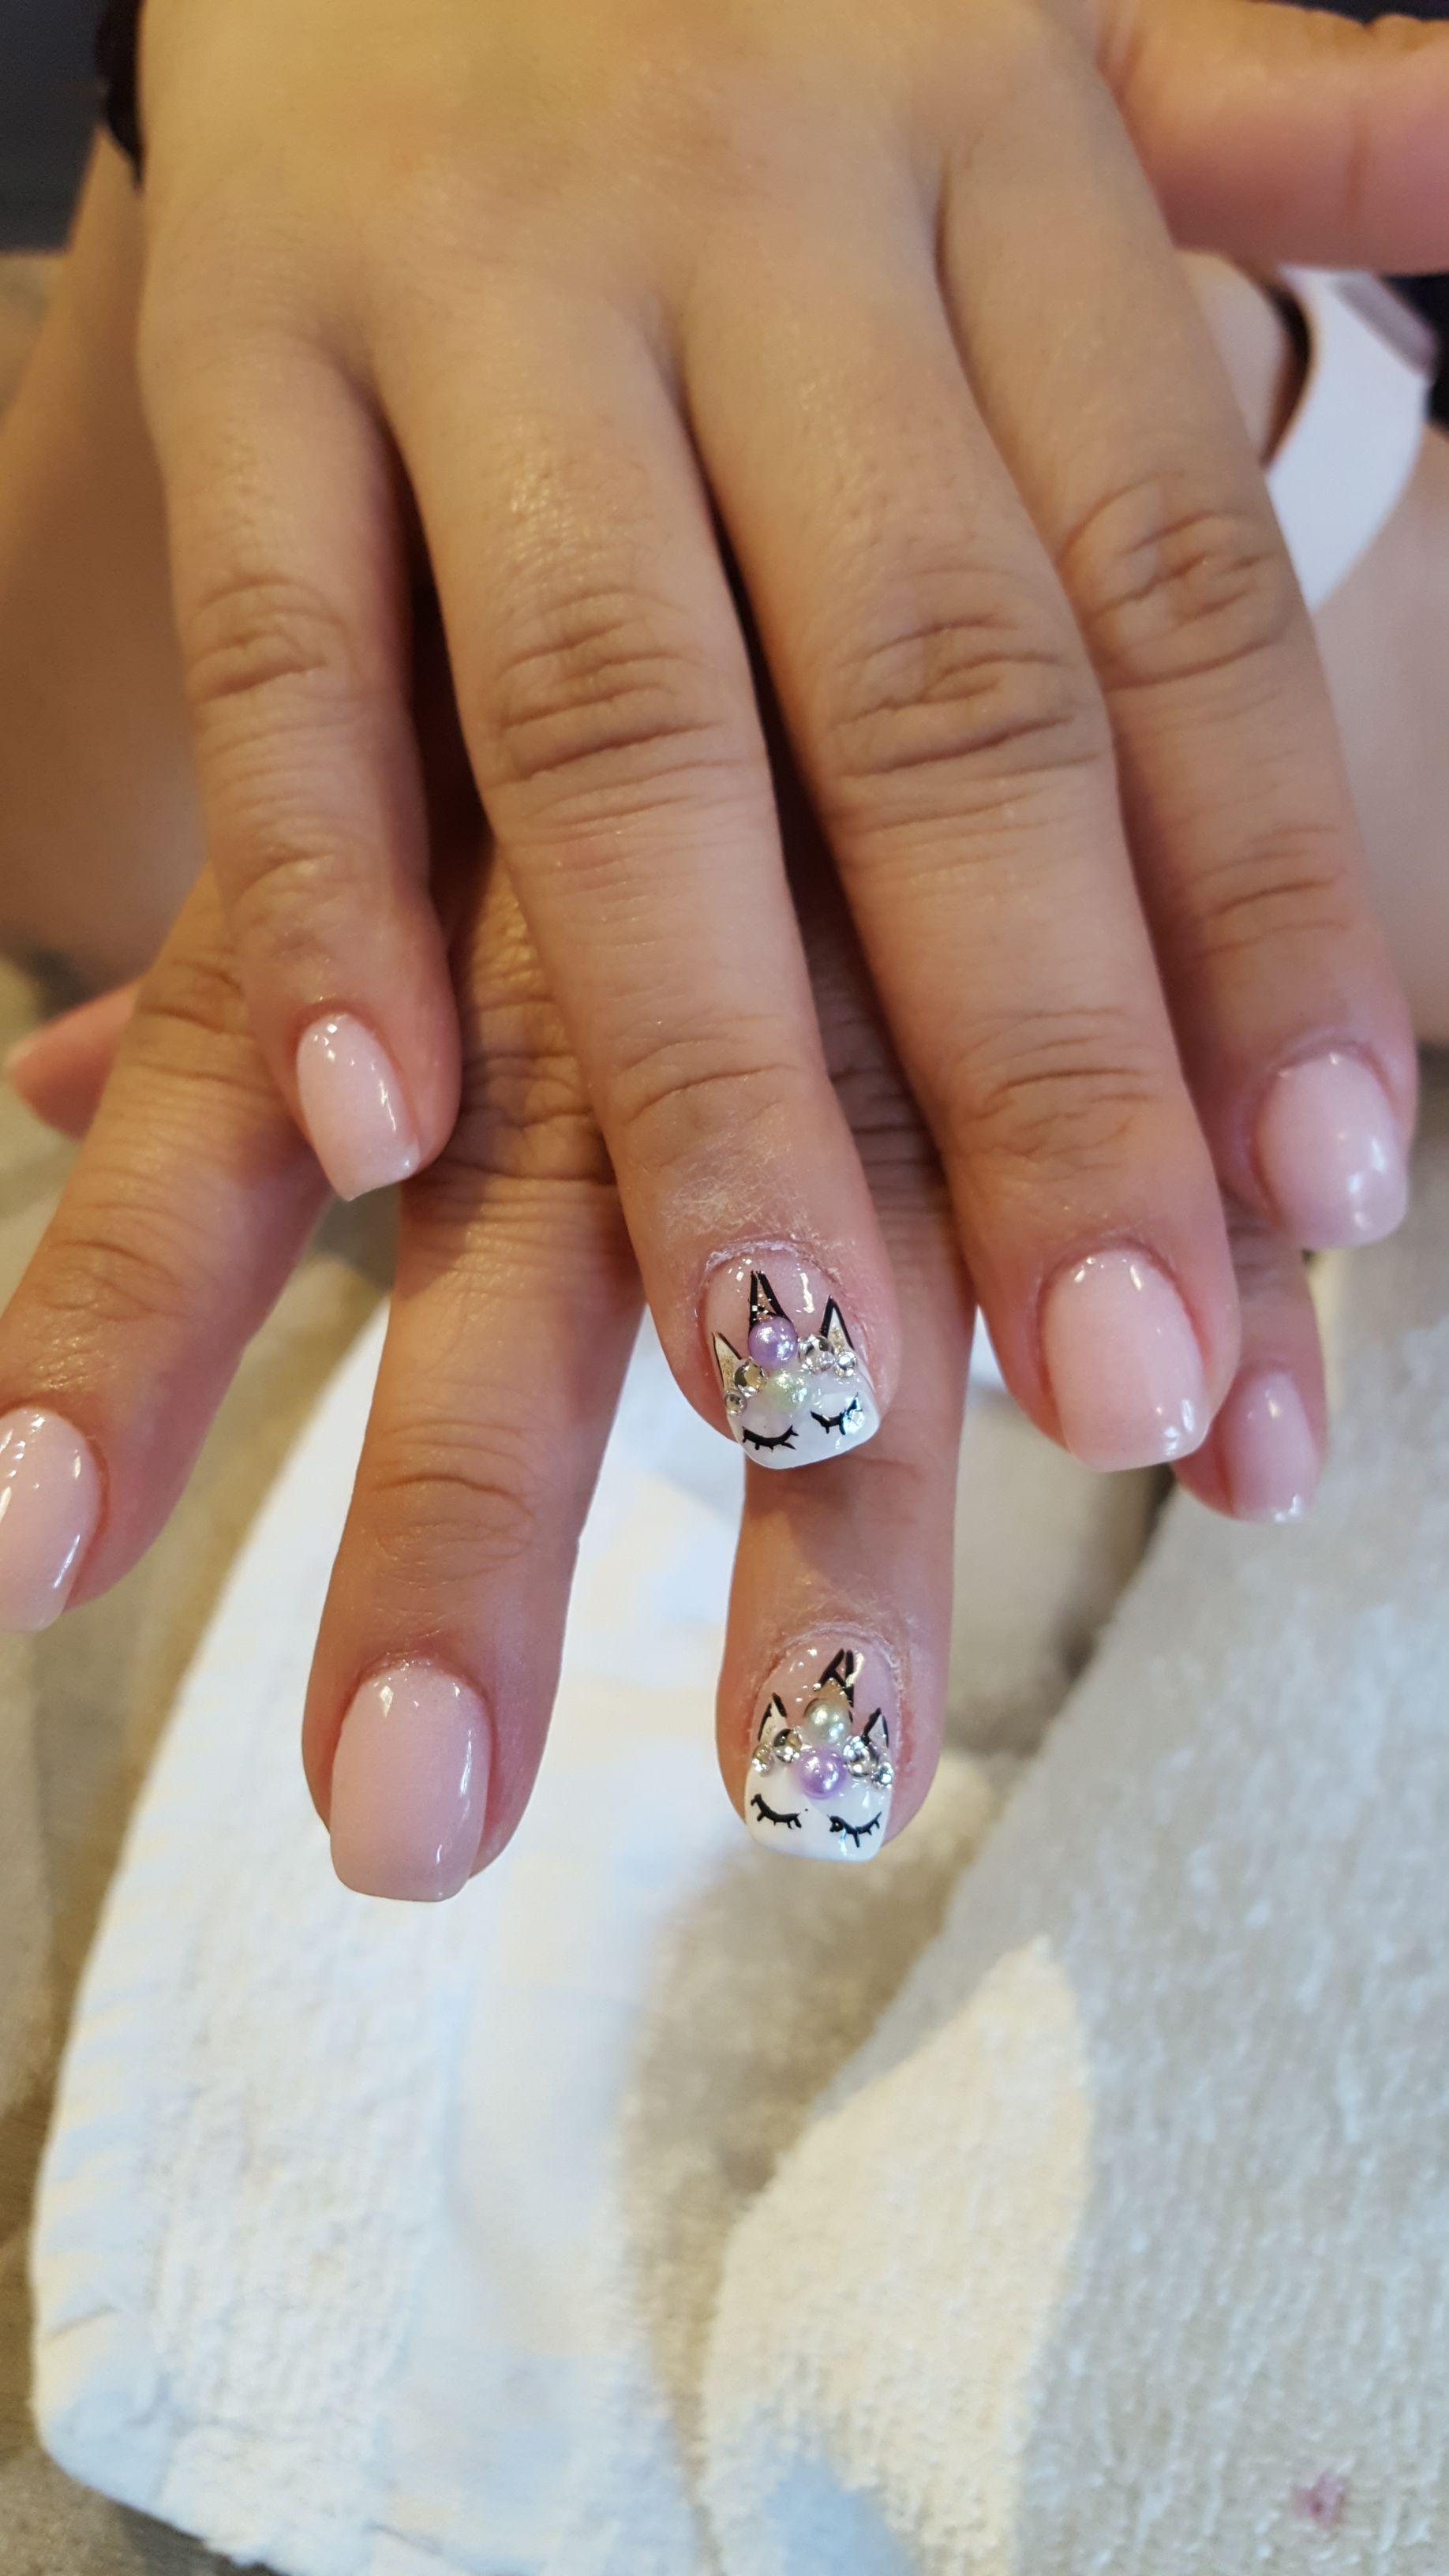 Sns Dip Powder Set With Unicorn Hand Art Design Dippowder Dippingpowder Snsdip Unicorn Unicornnails Cutenails Socu Cute Nails Unicorn Nails Nails